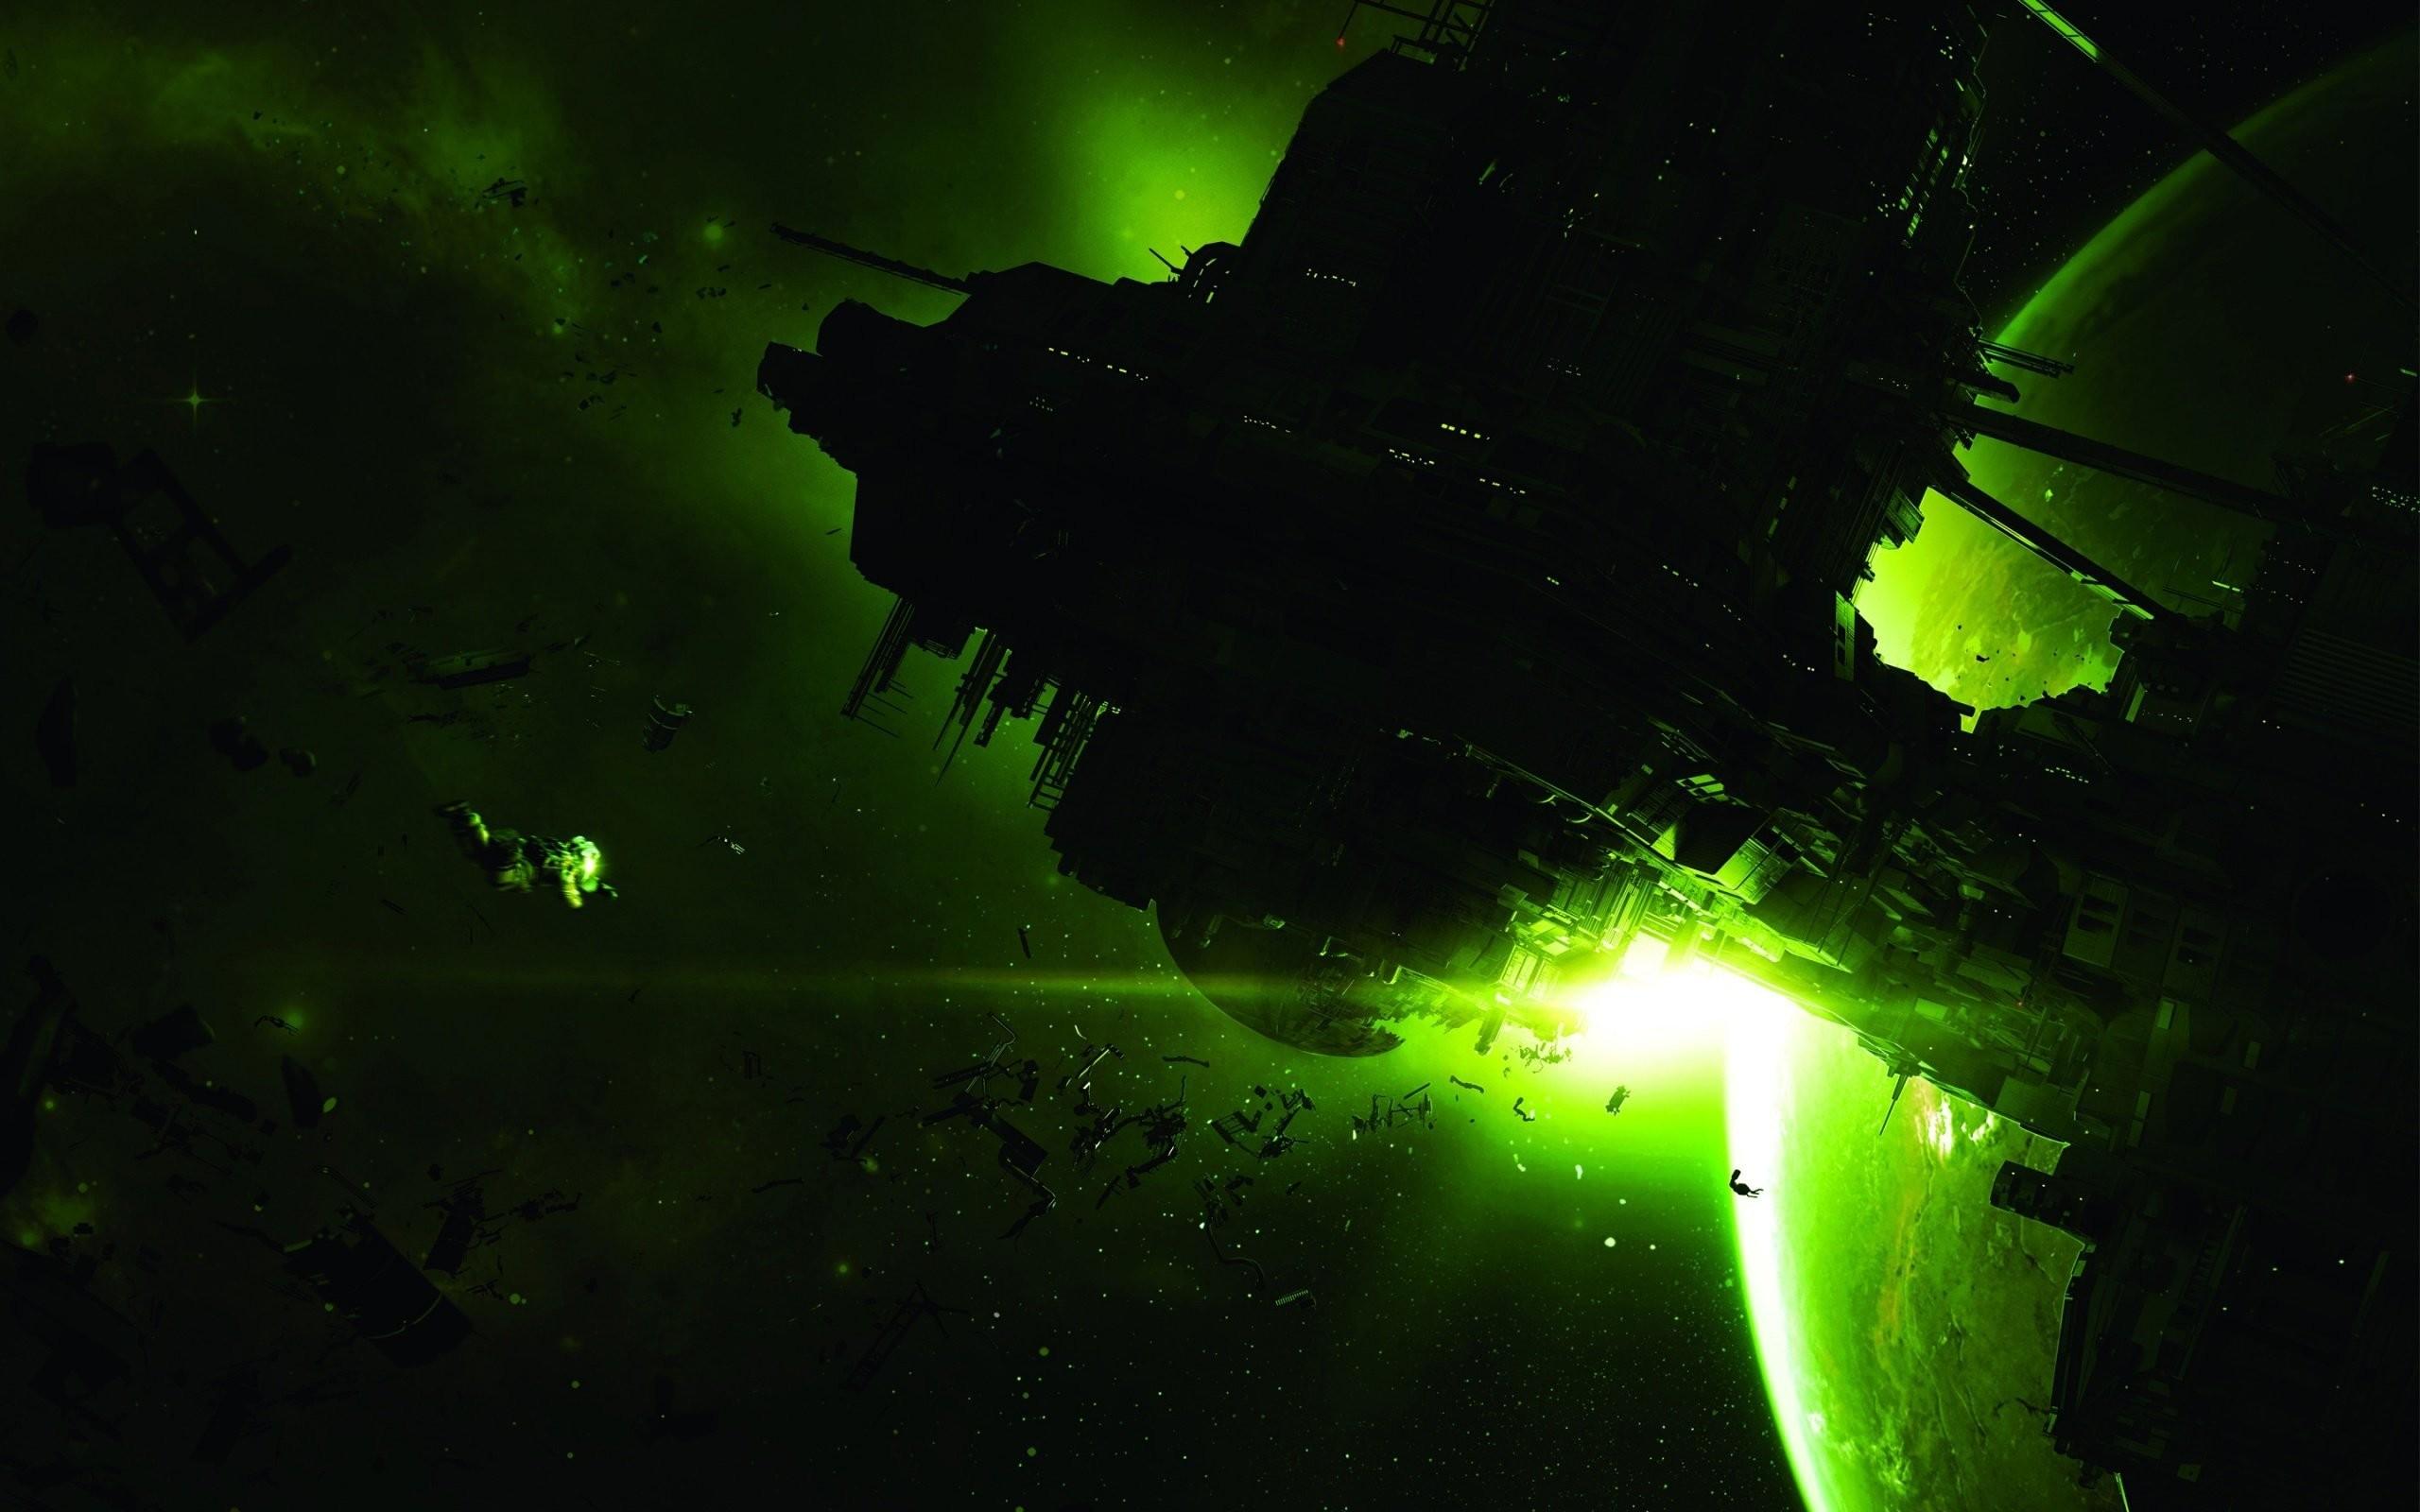 Alien: Isolation Wallpaper 2560×1600 304501 WallpaperUP Cool Alien  Isolation Wallpaper Free Wallpaper For